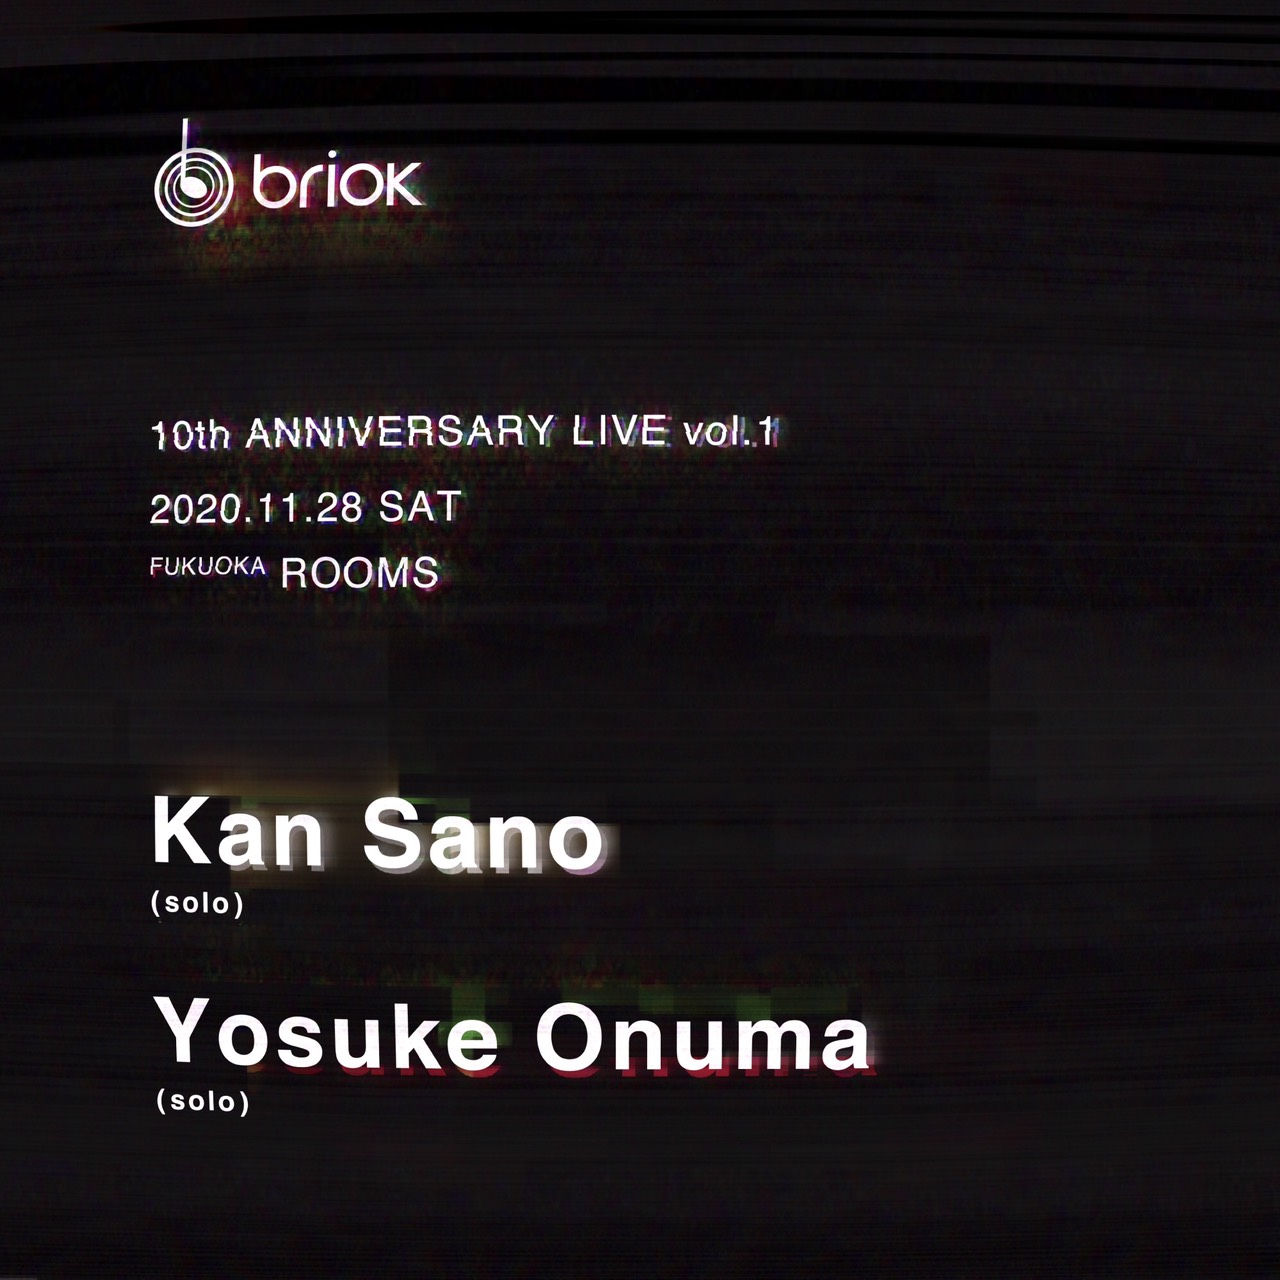 brick 10TH ANNIVERSARY LIVE vol.1 〈2nd stage 〉